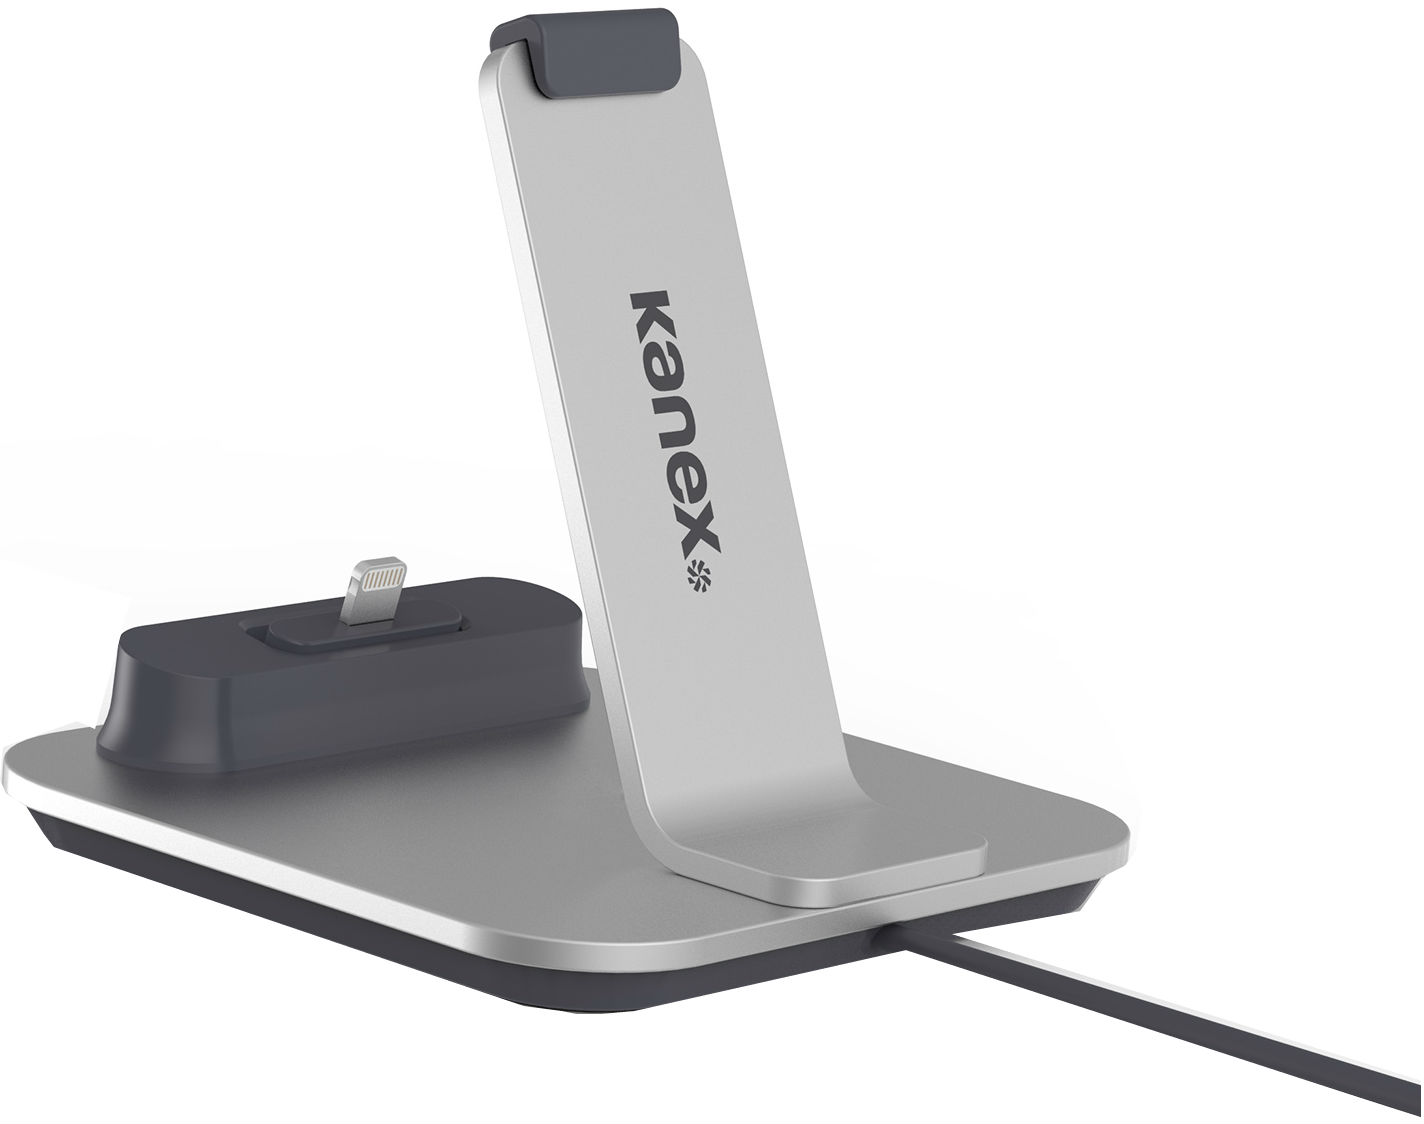 Kanex Dock (K8PDOCK) - док-станция для iPhone 6S/6S Plus (Silver)